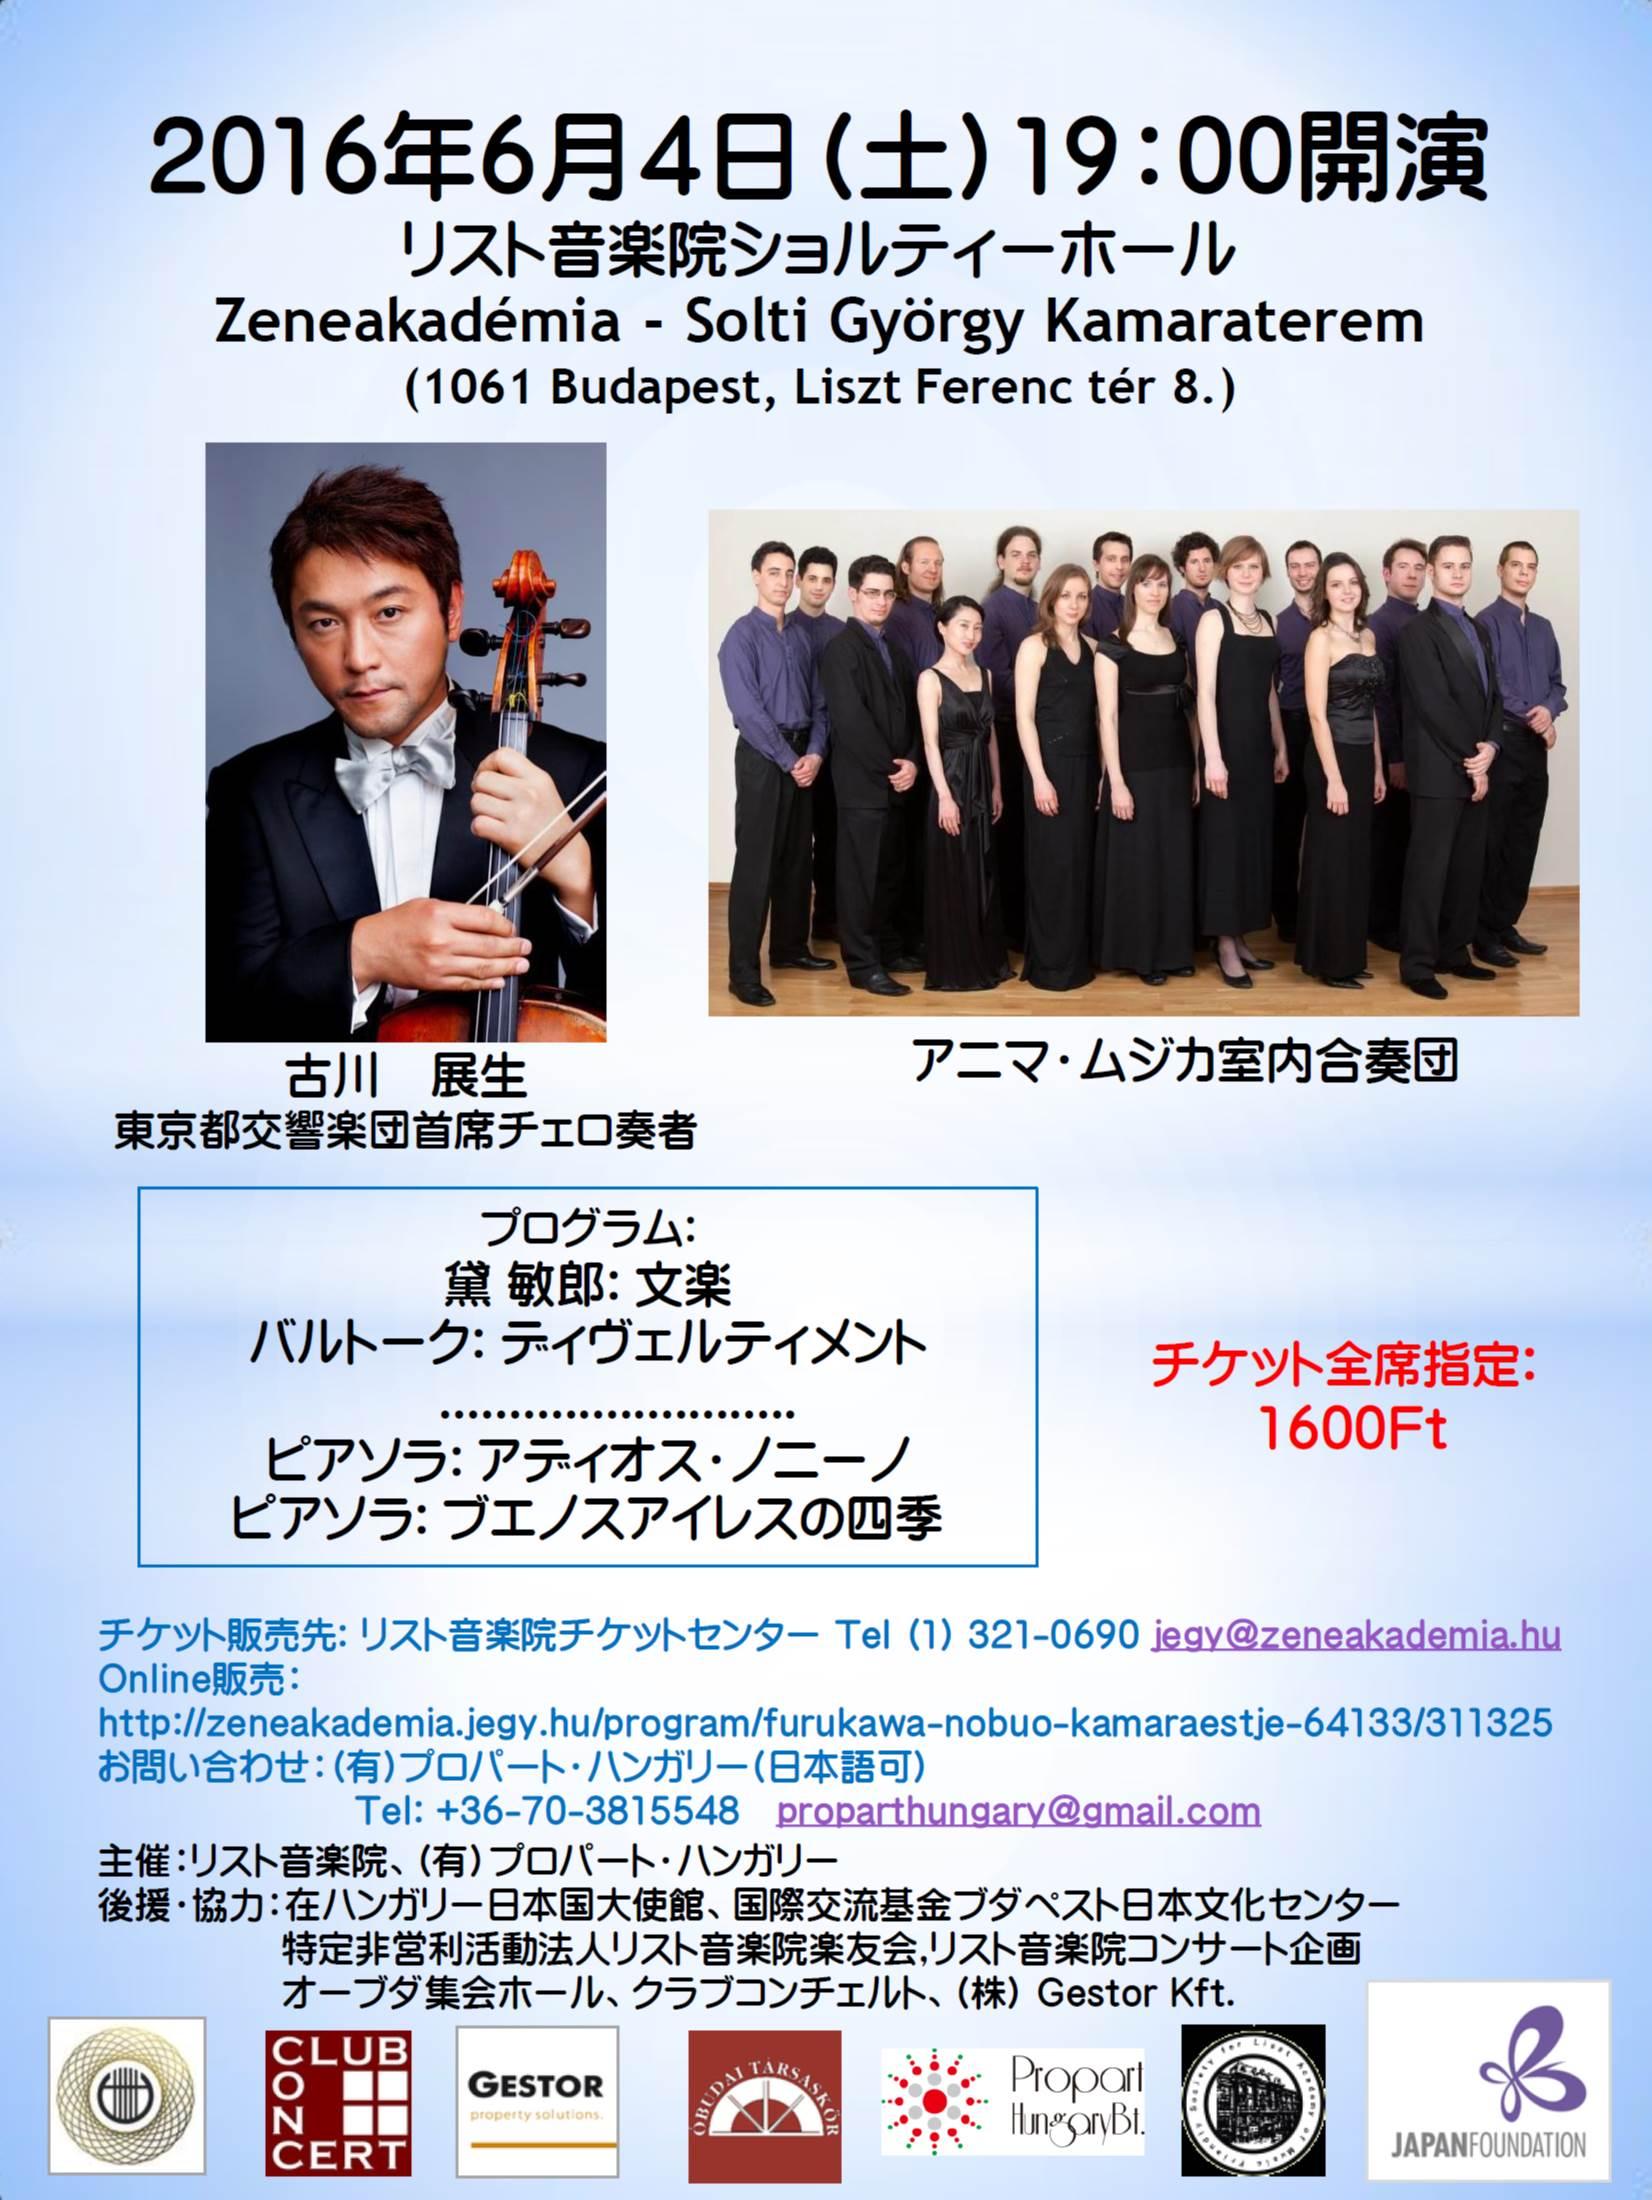 Furukawa Nobuo Concert